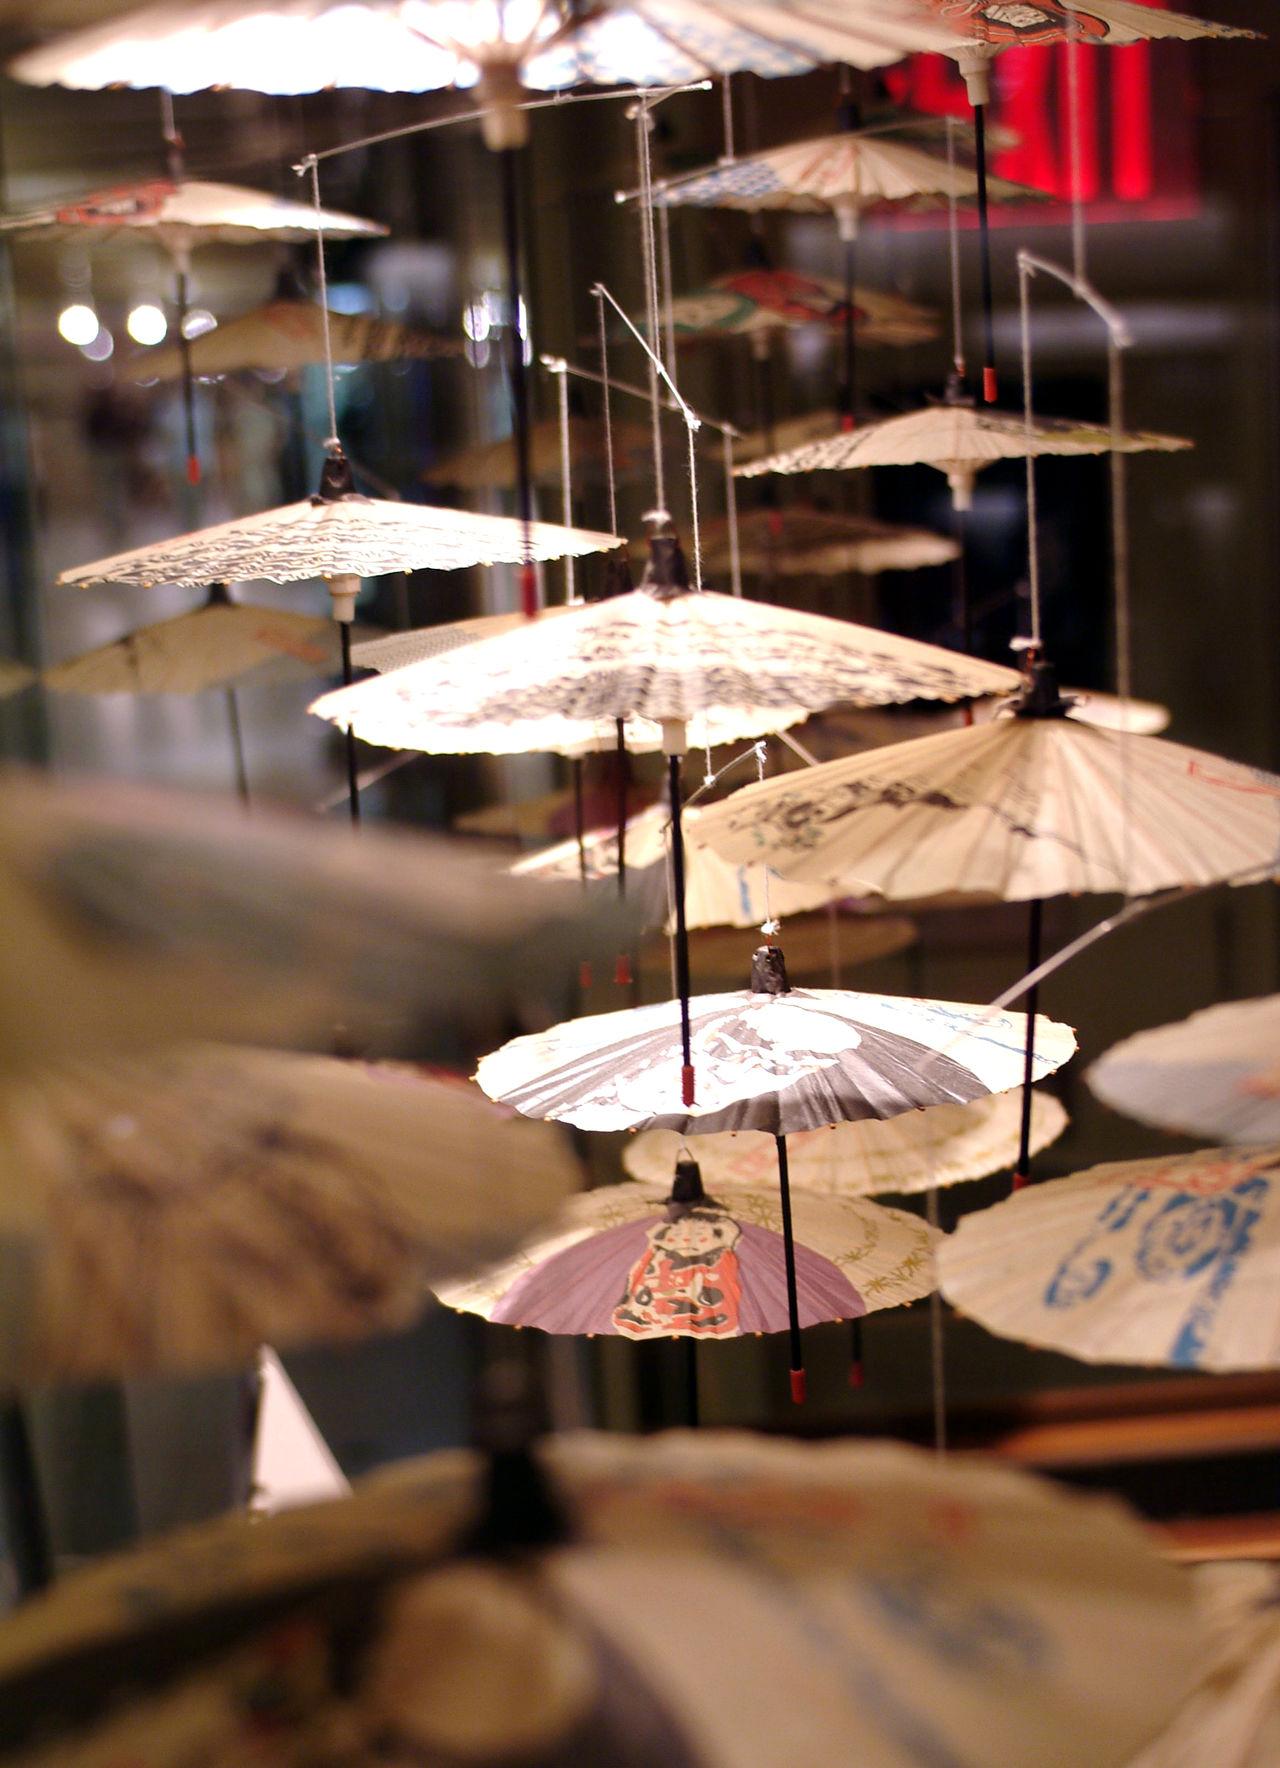 Hanging Umbrella Mobile Hand Painted Hanging Art Little Umbrellas Mobile Paper Mobile Paper Umbrellas Umbrella Umbrella Art